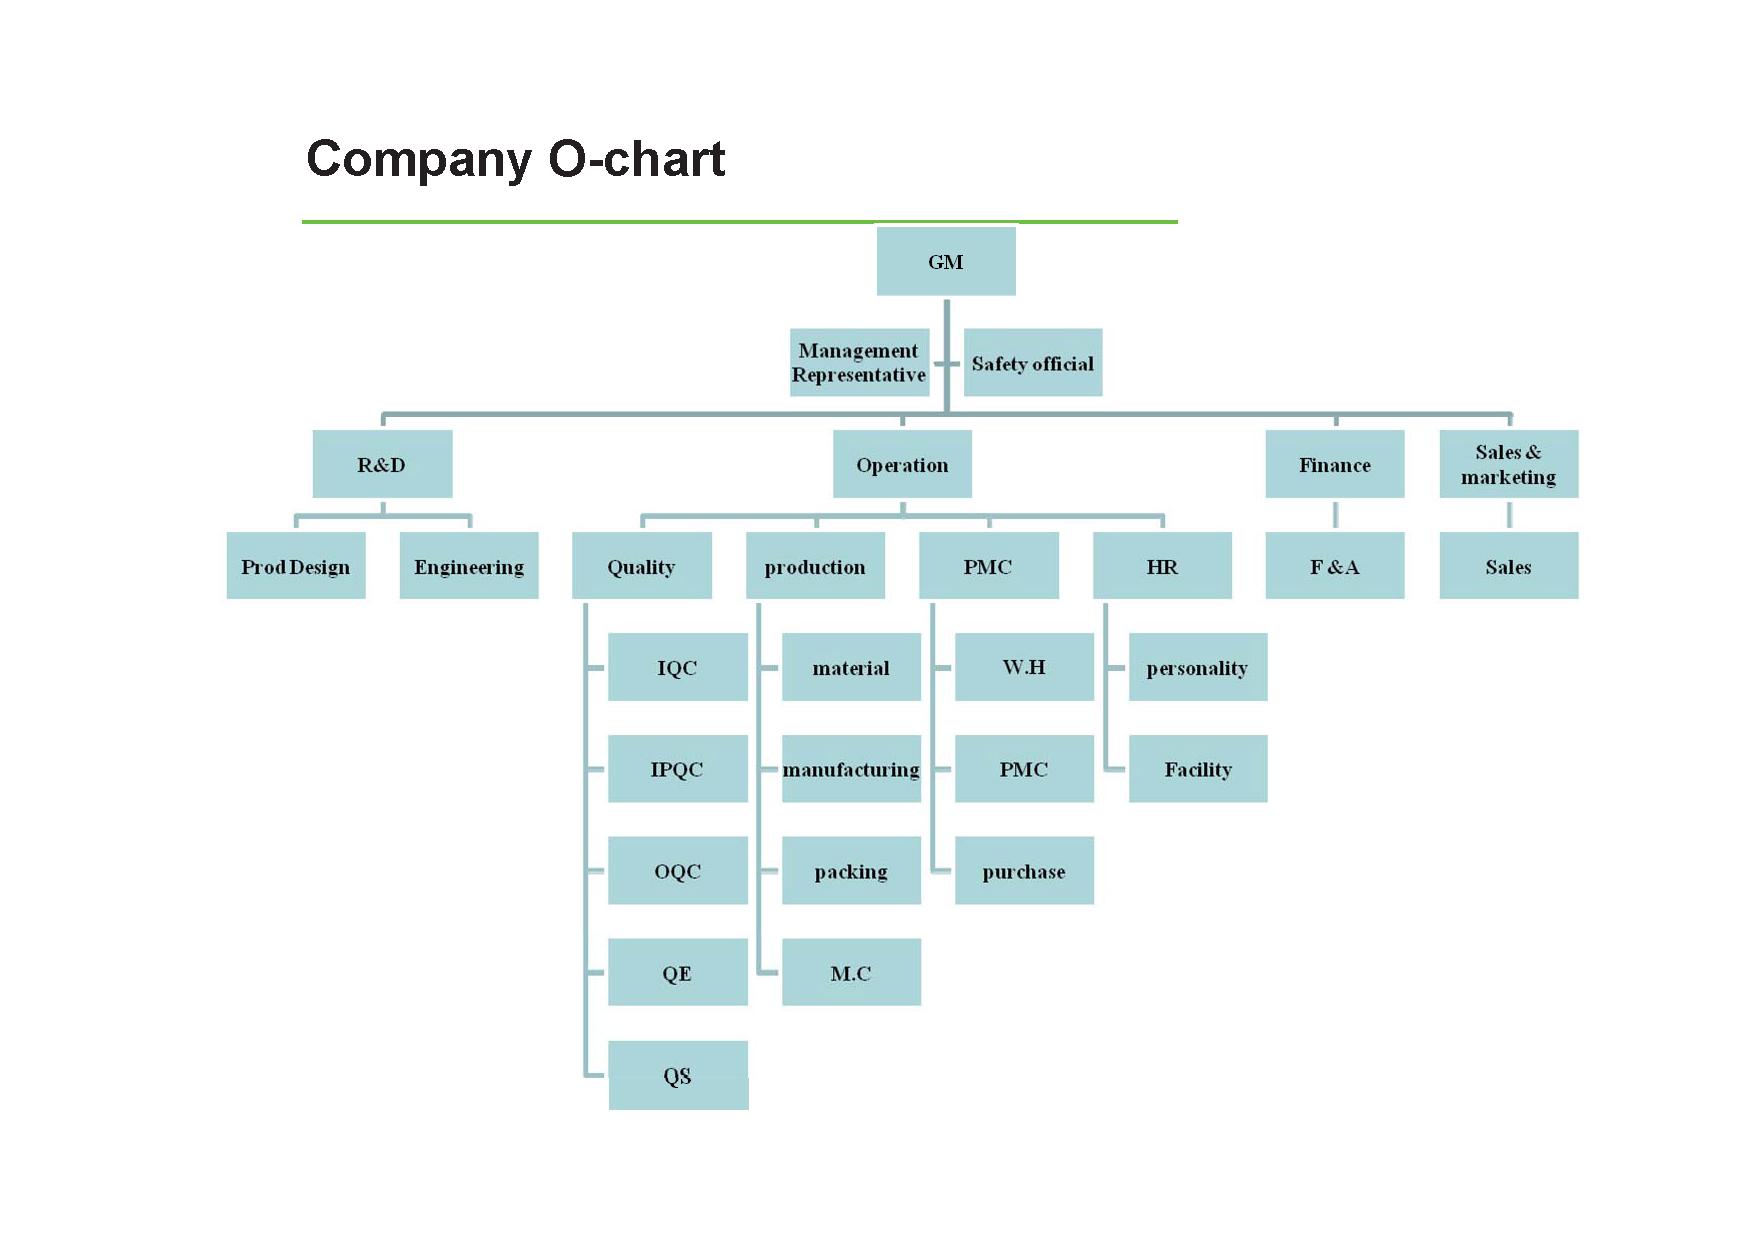 Company O-chart